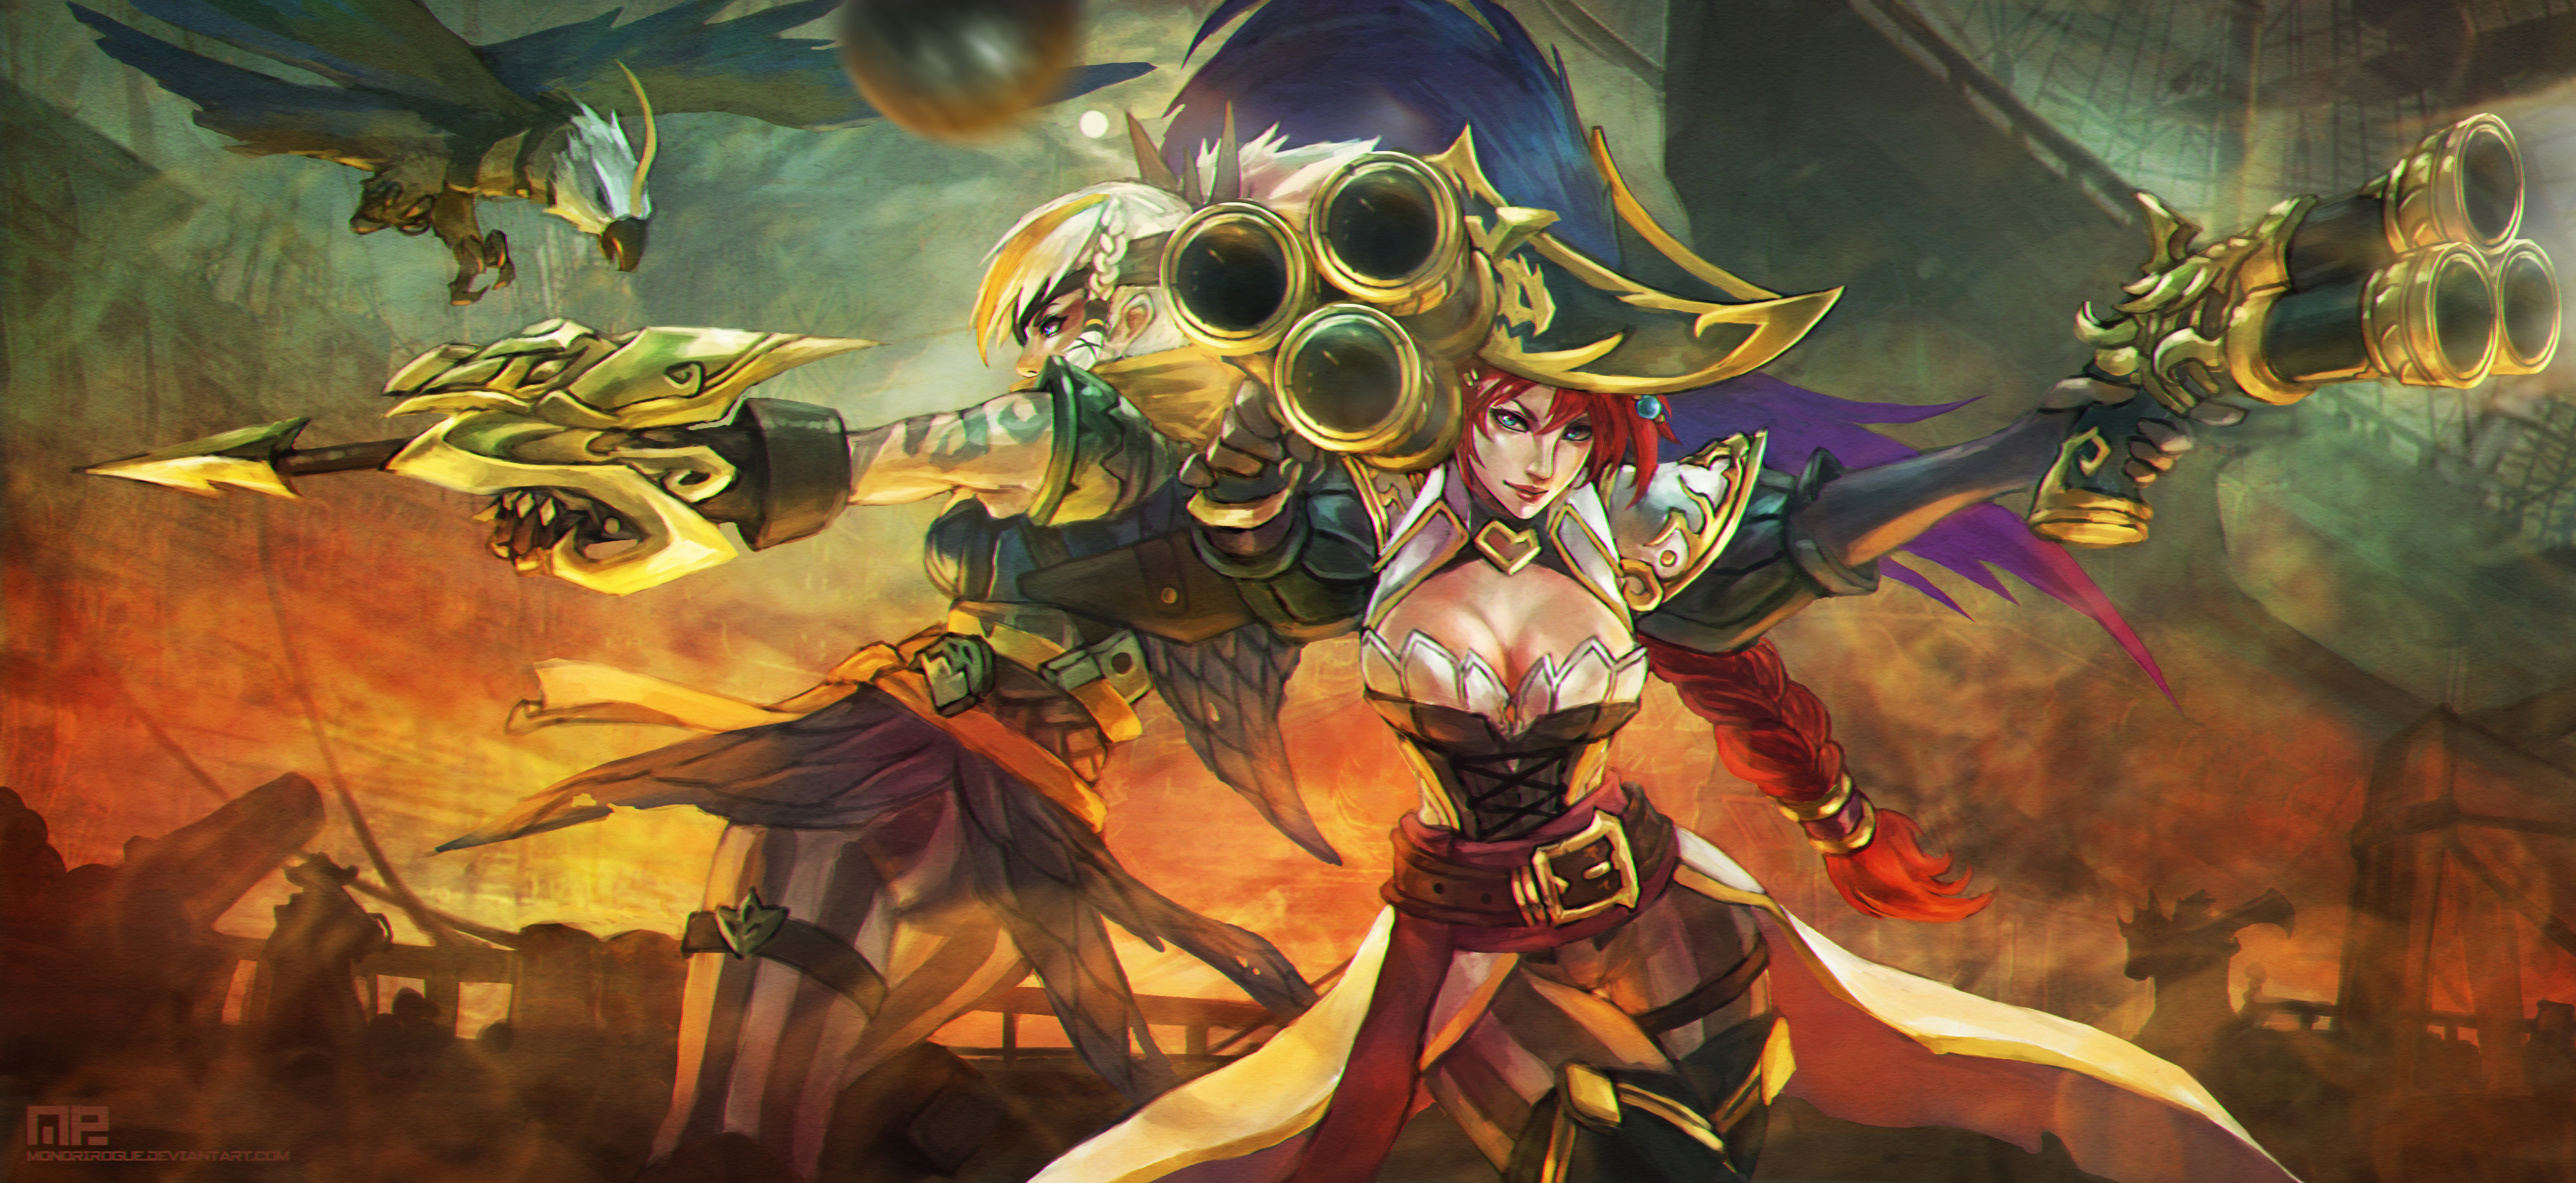 League Of Legends Miss Fortune Wallpaper: League Of Legends 4k Ultra HD Wallpaper